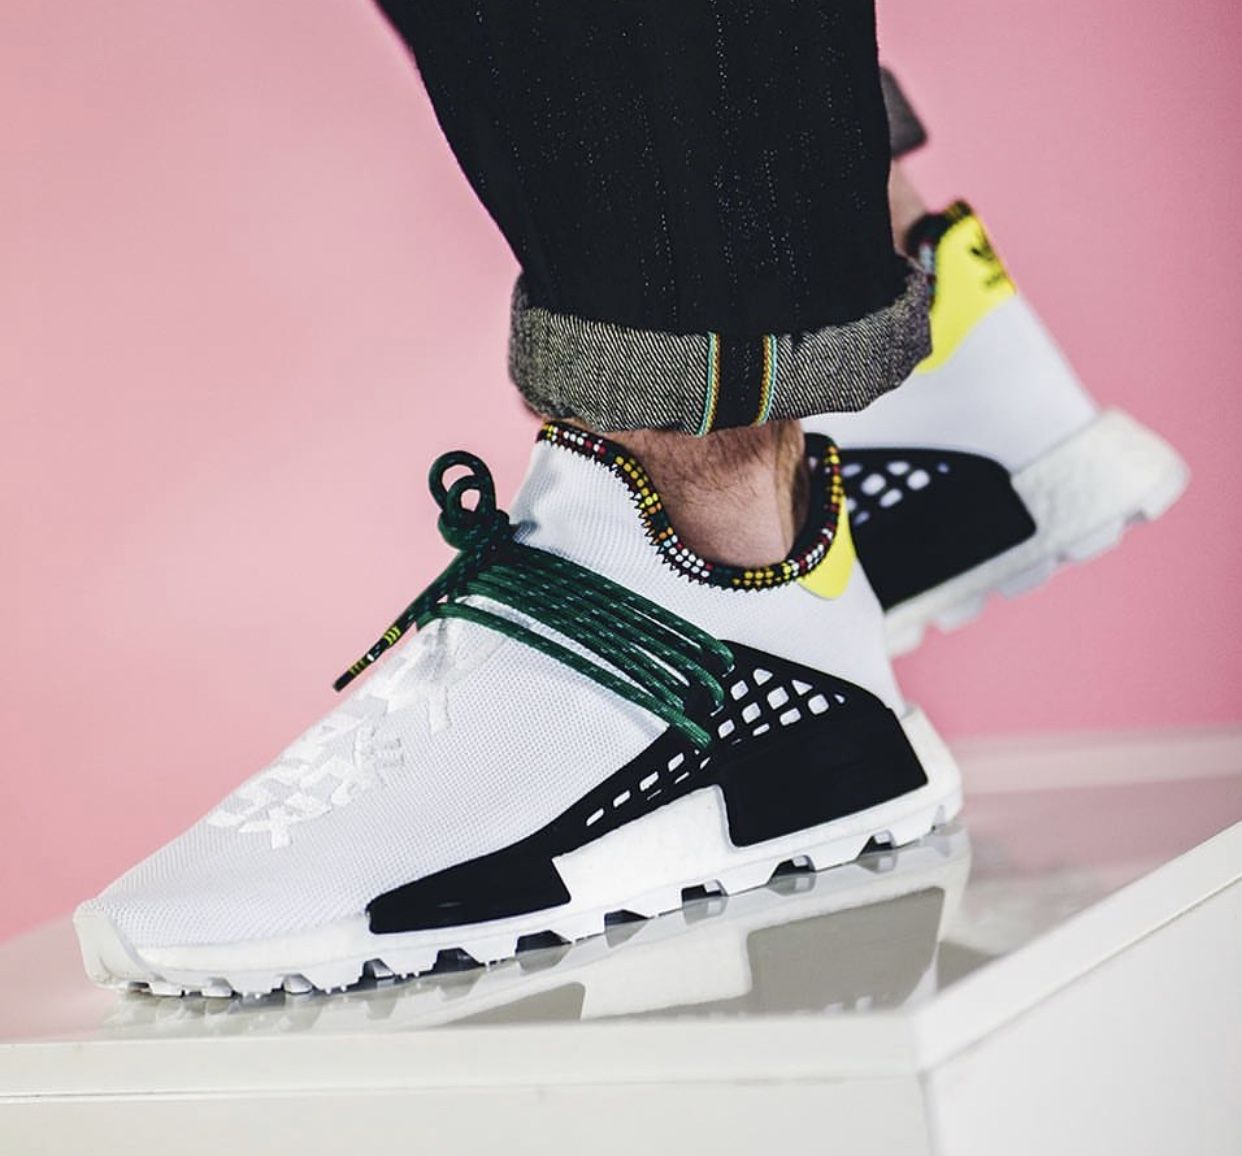 Adidas | Sneakers men fashion, Adidas